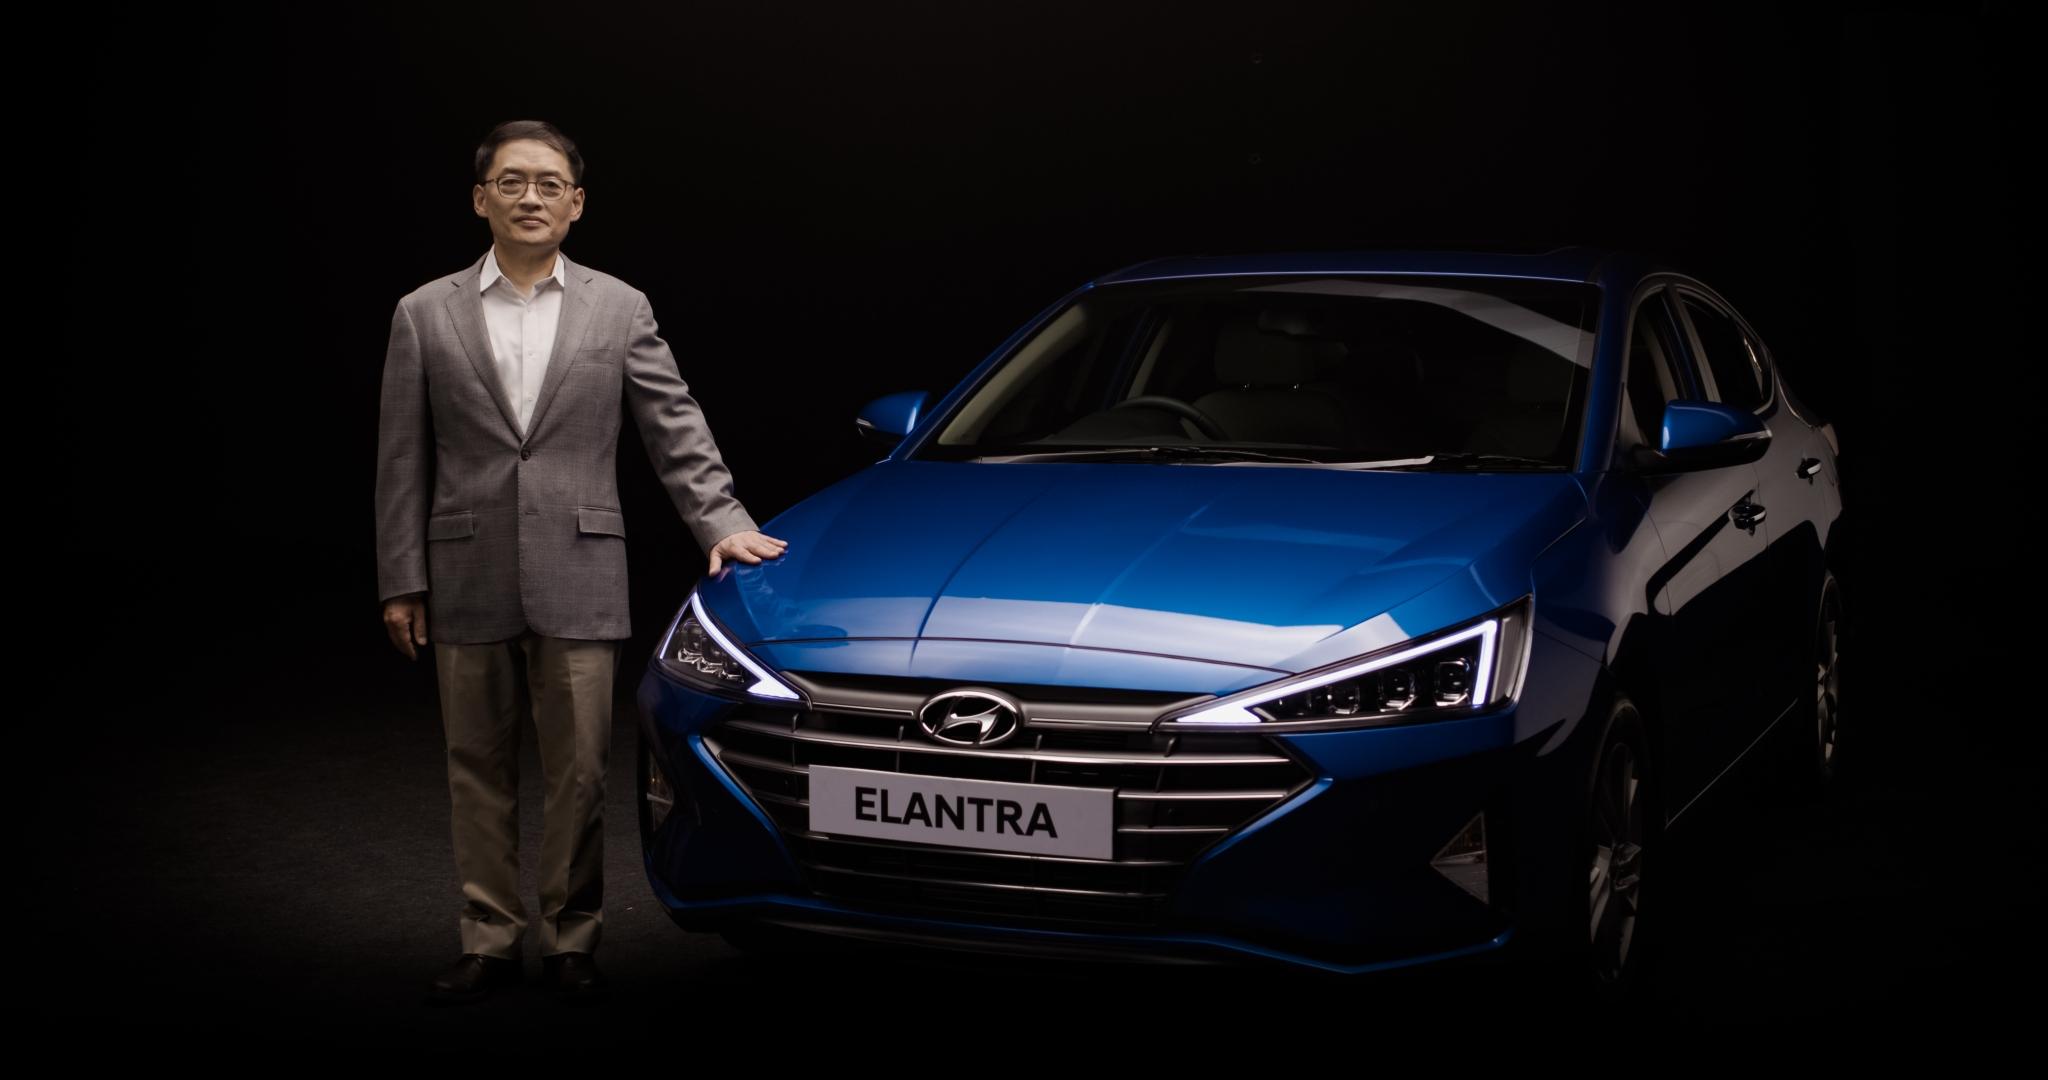 Hyundai Launches 2019 Elantra, Prices Start at Rs 15.89 Lakh